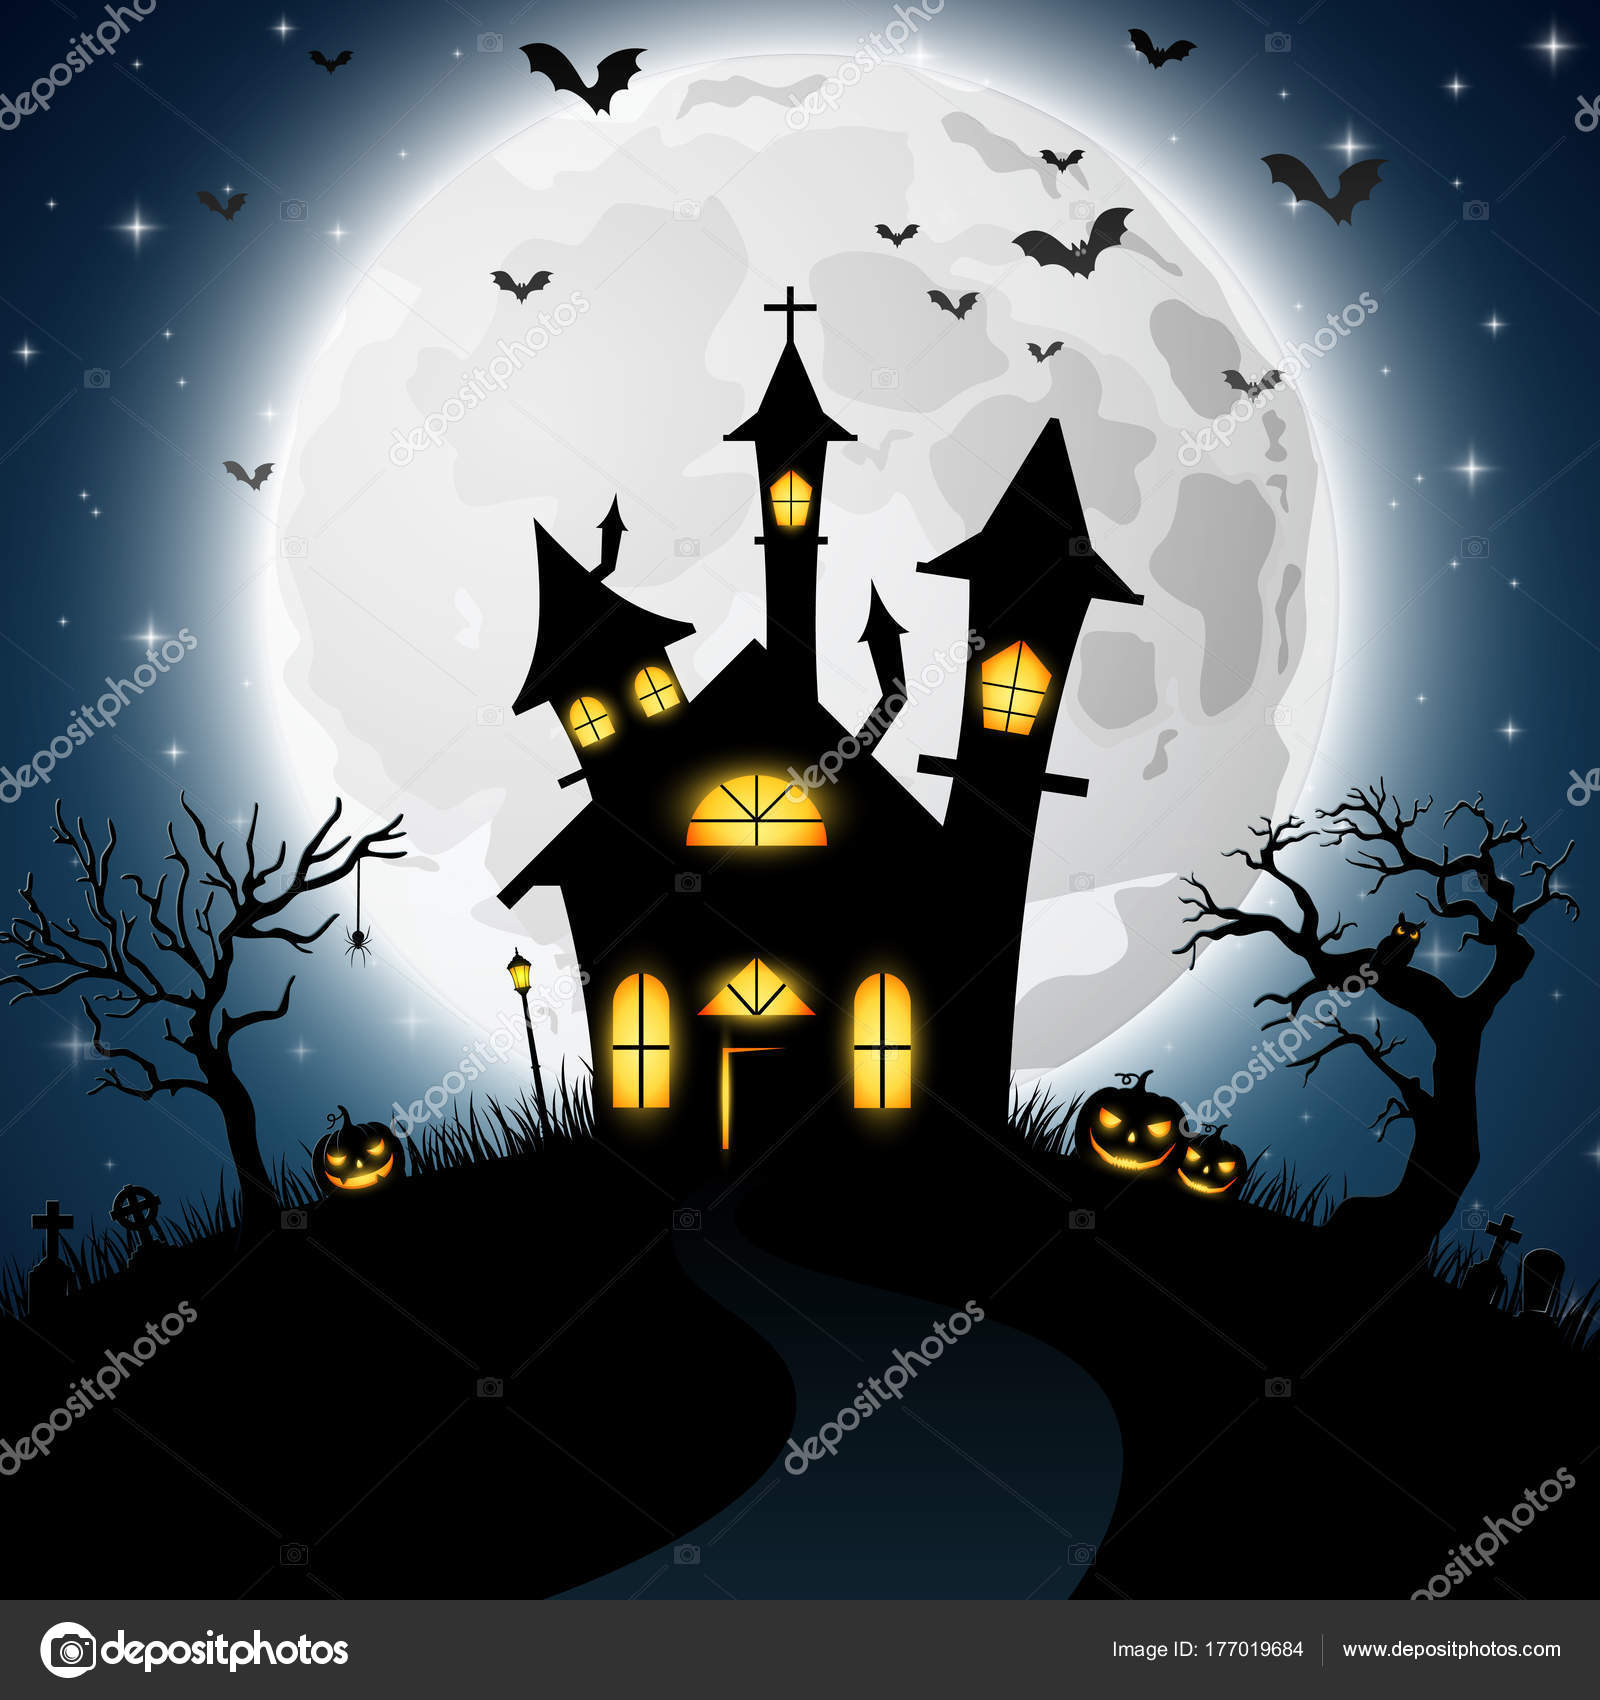 Halloween Chiesa.Priorita Bassa Halloween Con Spaventoso Chiesa Vettoriali Stock